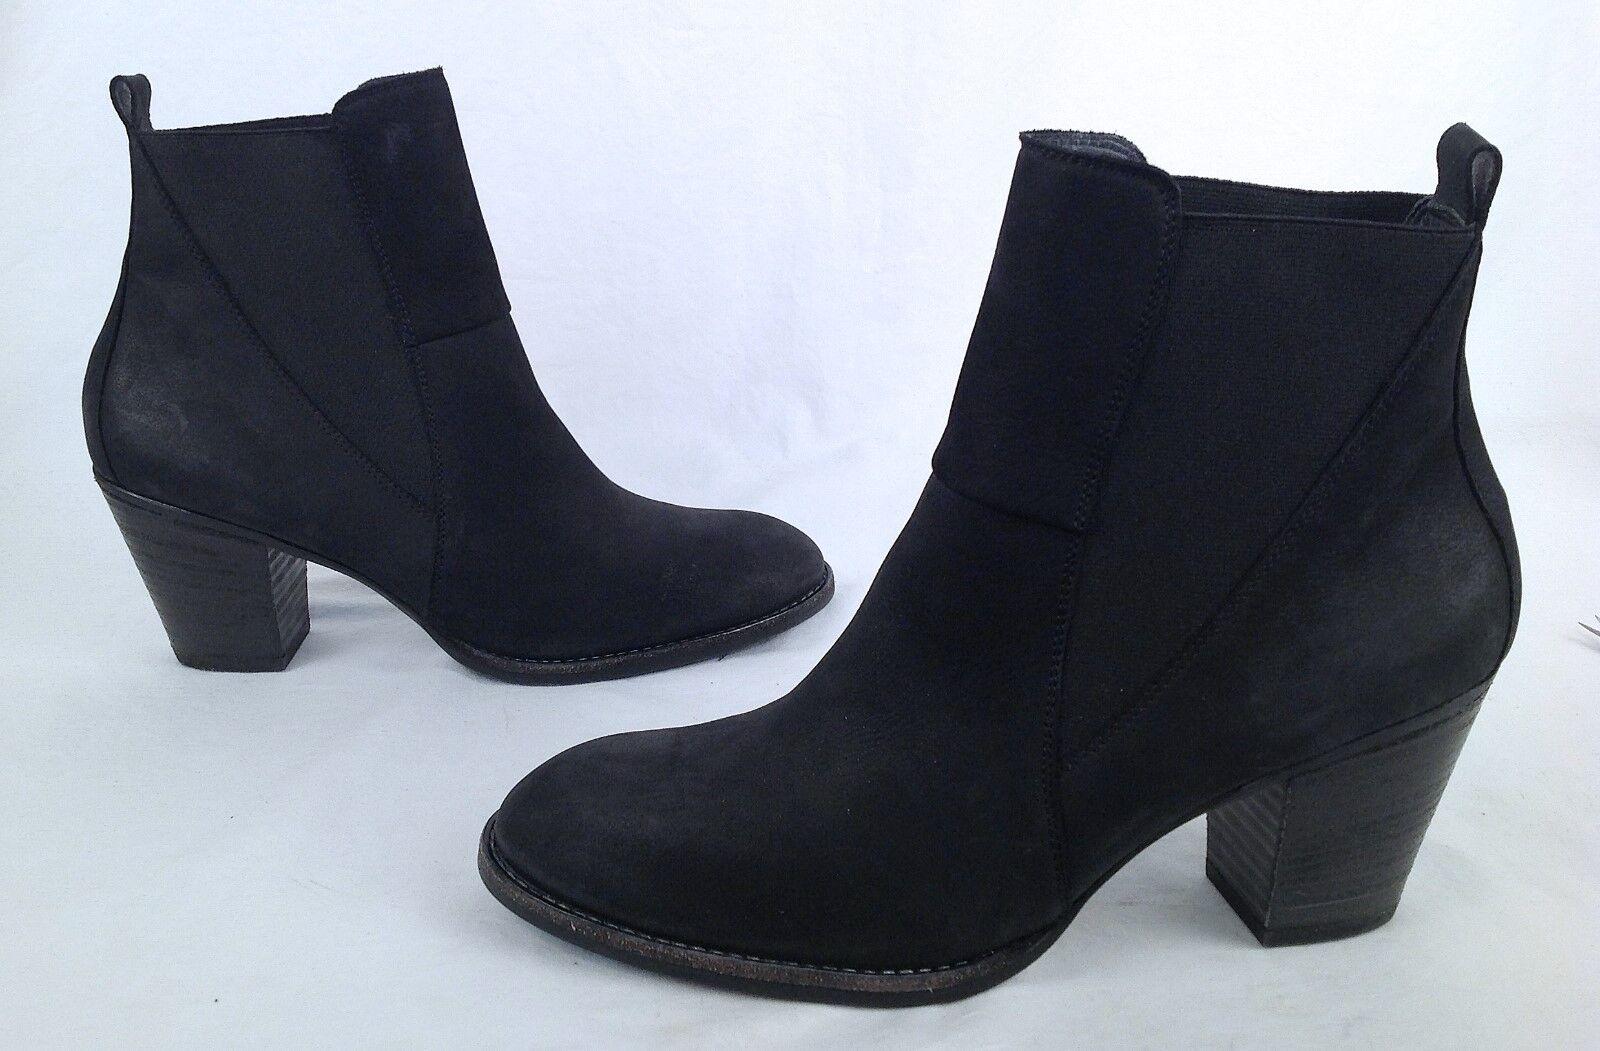 NEW   Paul Green 'Jules' Black Nubuck Bootie-Size US 10  7.5 EU  (P10)